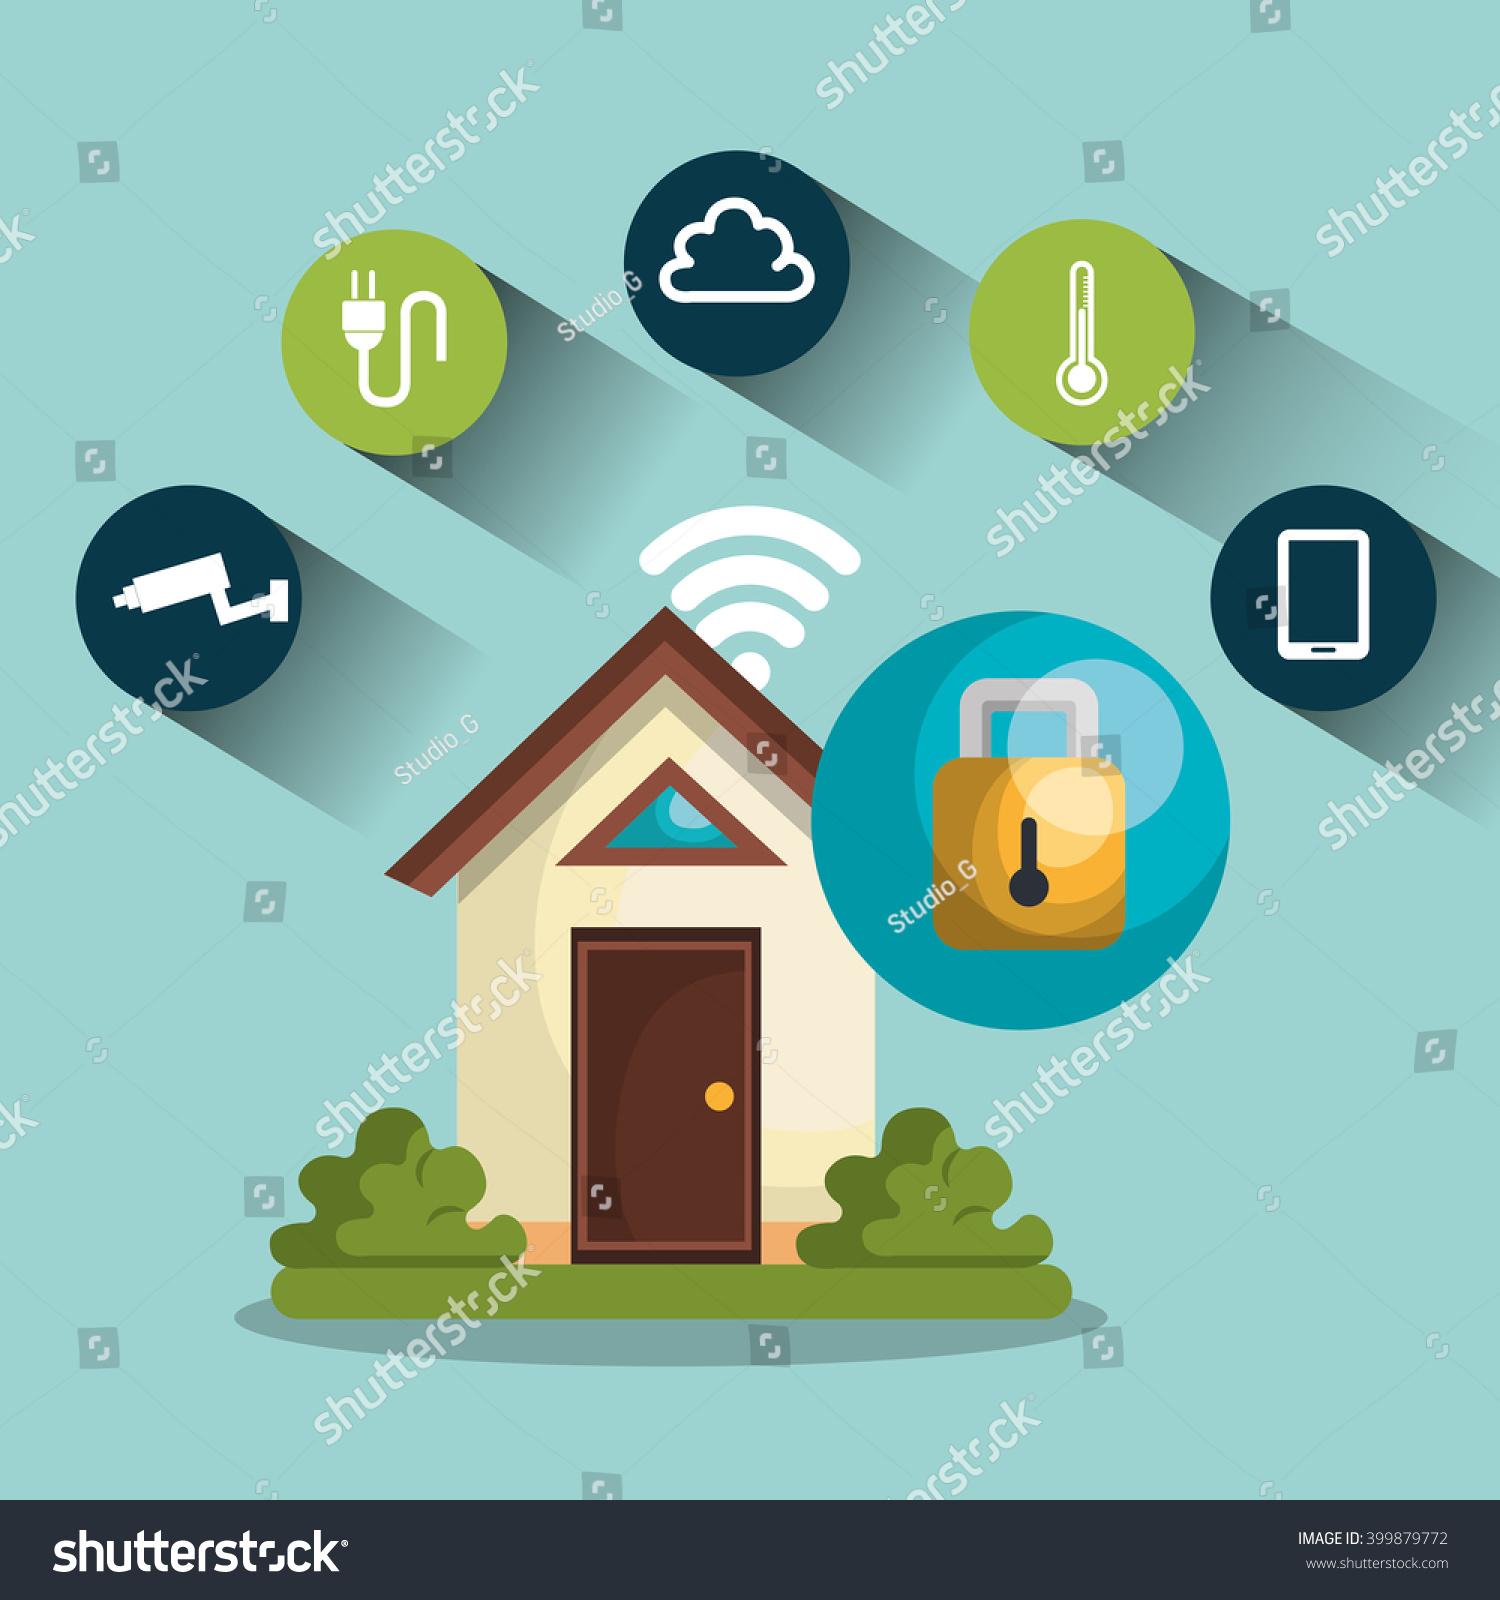 Smart Home Design Stock Vector 399879772 - Shutterstock